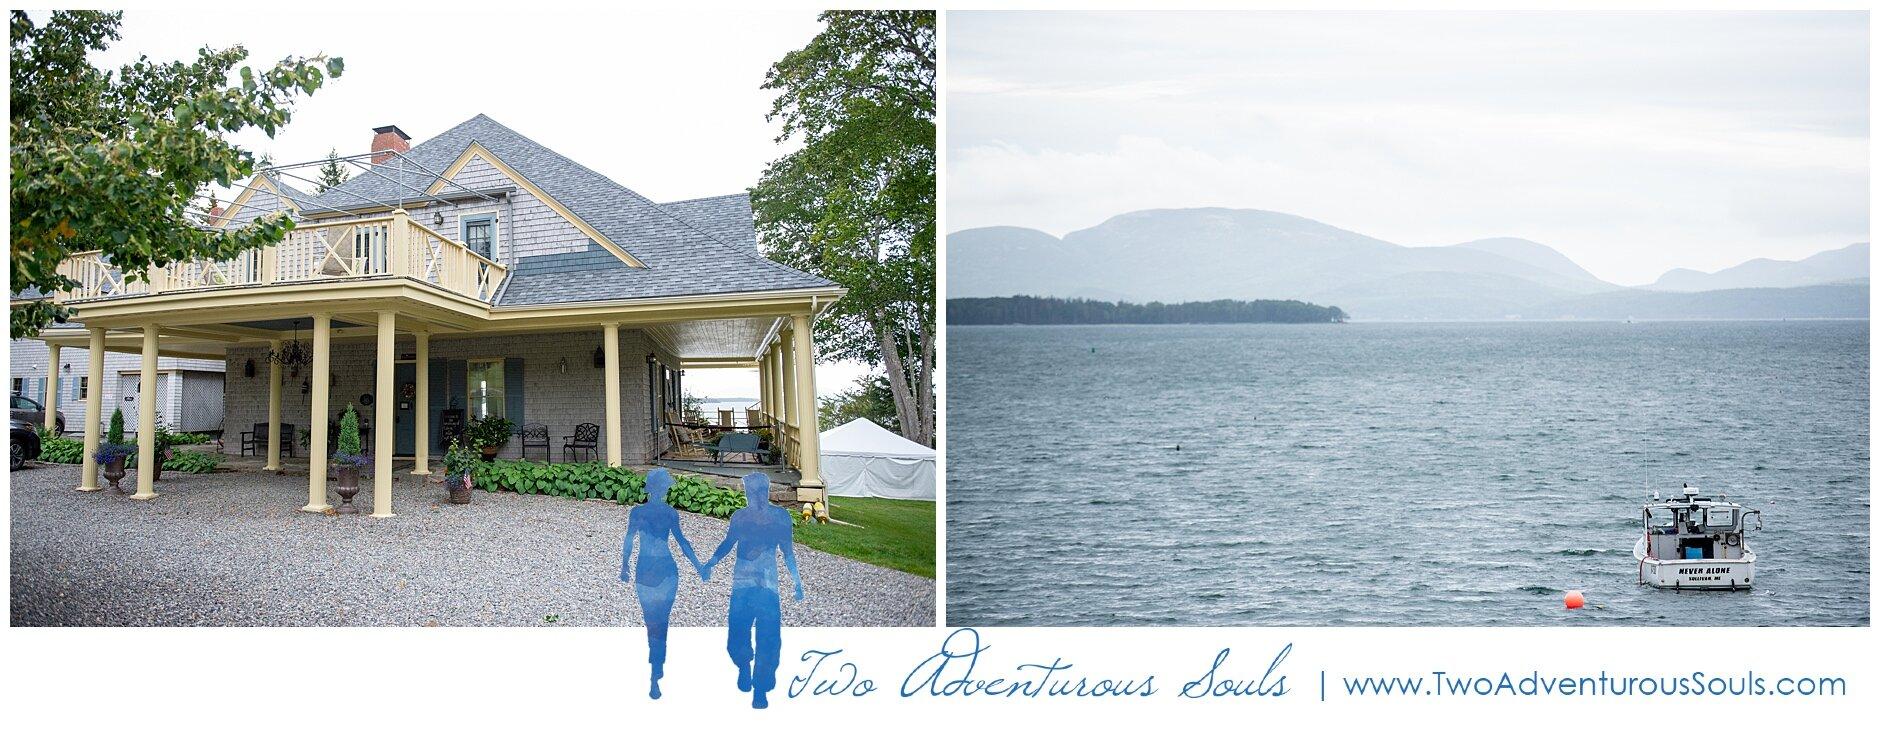 Bar Harbor Wedding Photographers, Acadia Bay Inn Wedding Photographers, Two Adventurous Souls- 091419_0001.jpg